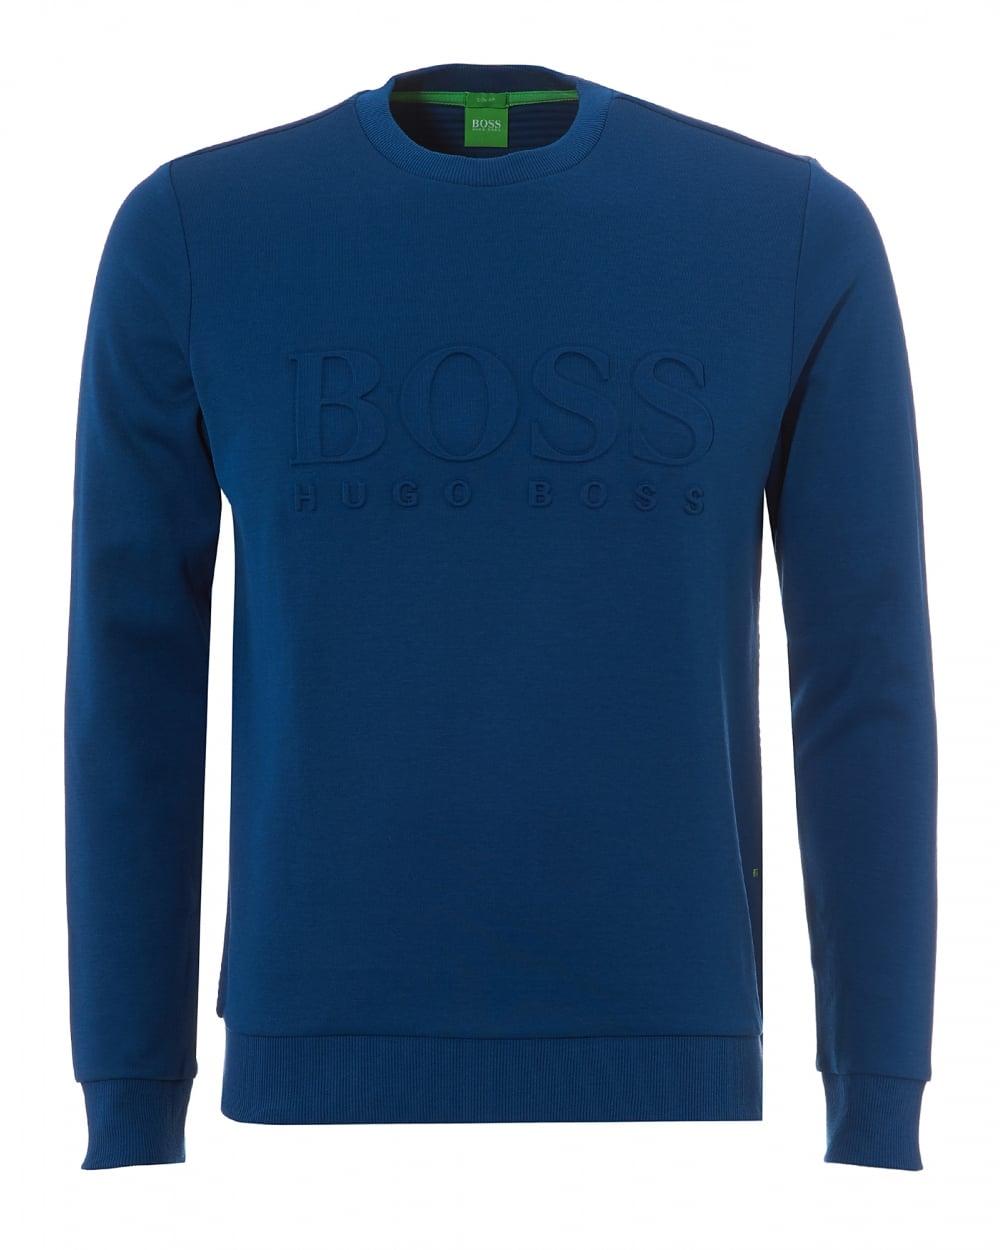 a813841e3 Hugo Boss Green Mens Salbo Crew Neck Poseidon Teal Blue Sweatshirt